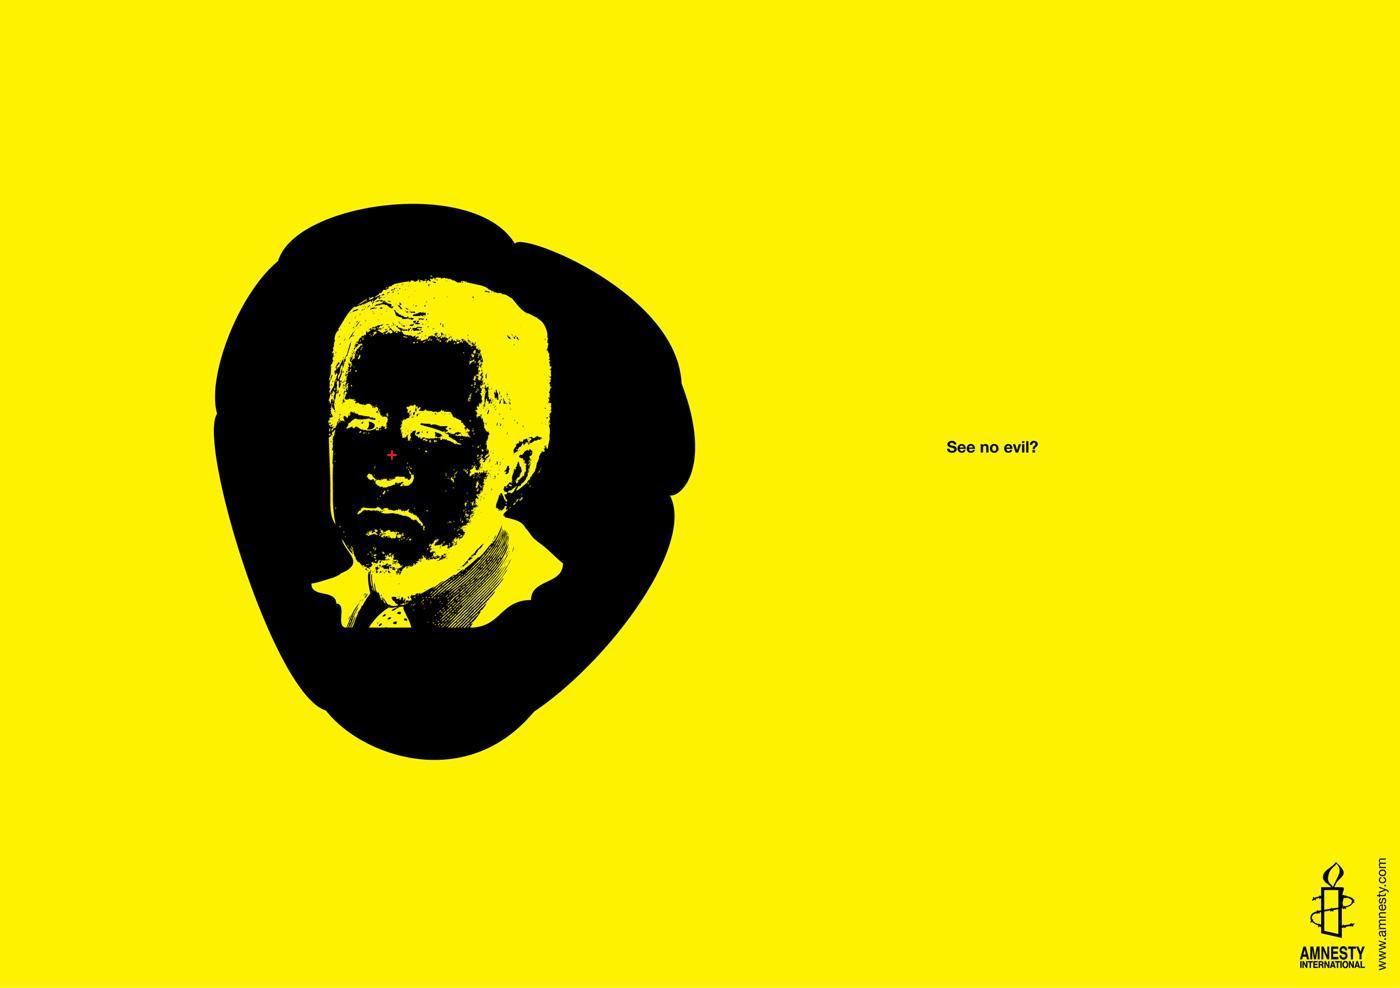 Amnesty International Print Ad -  See no evil, 1